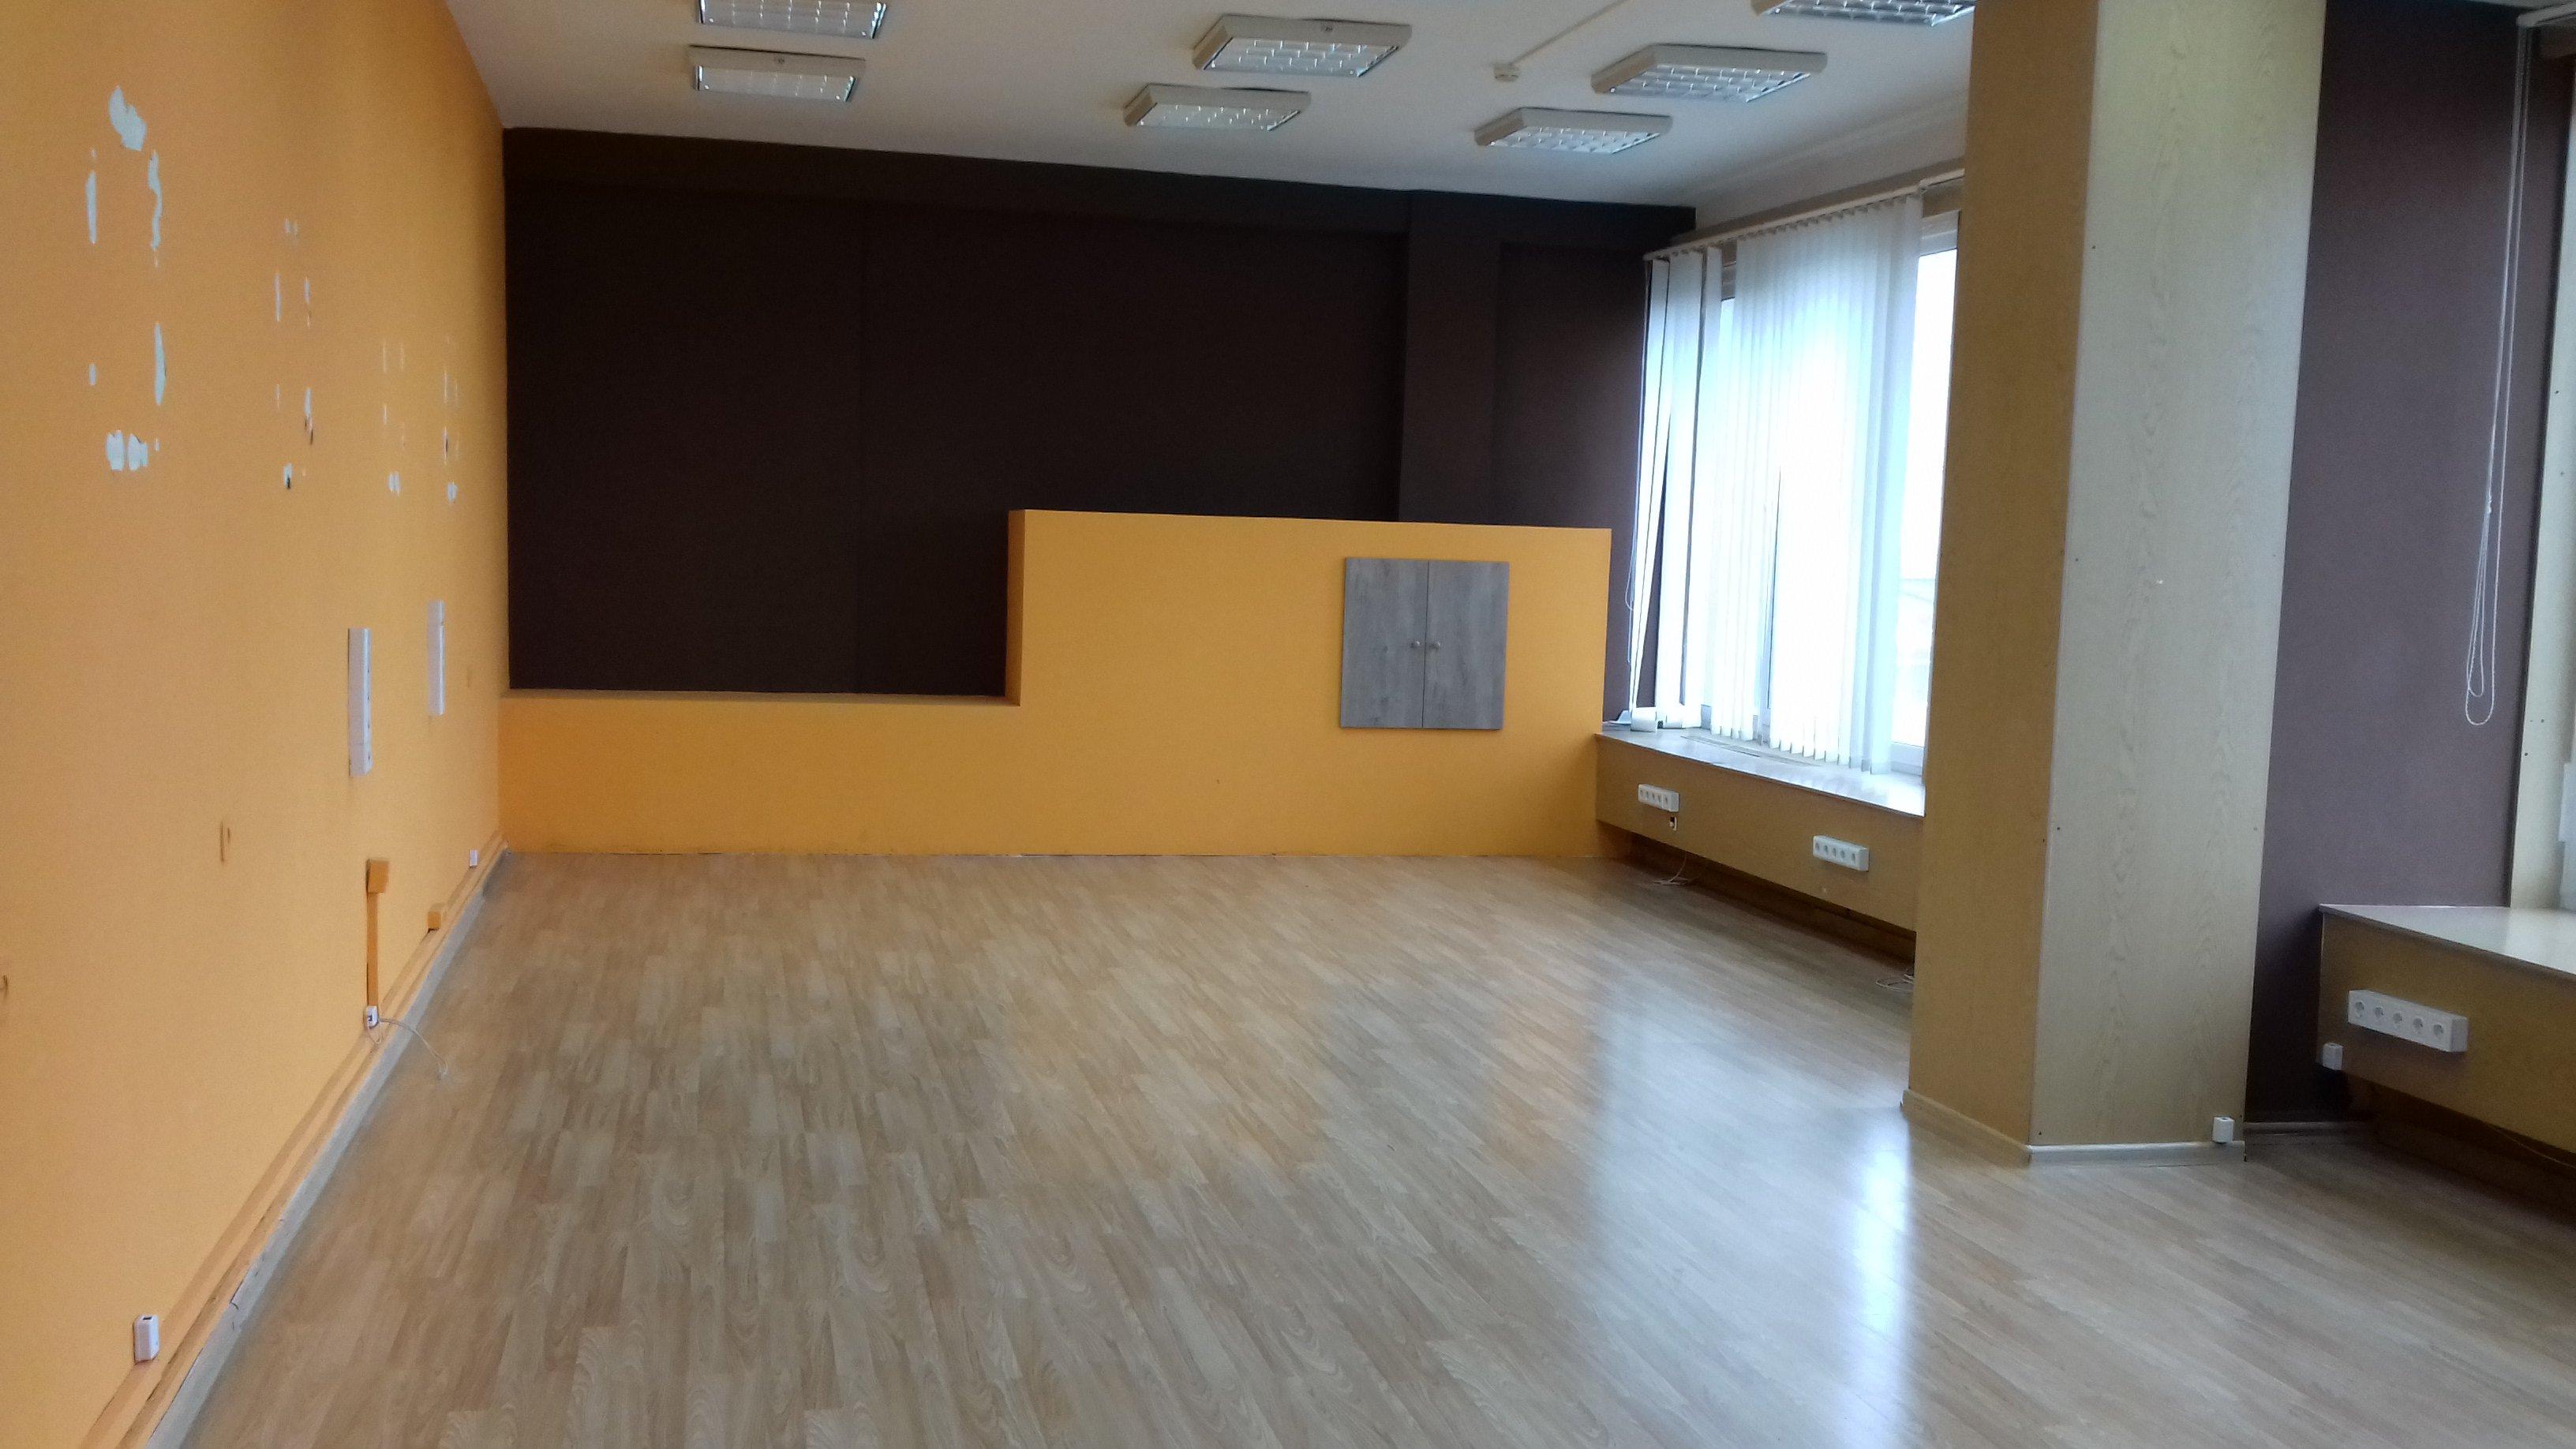 Аренда офиса услуги посредничество аренда офиса в районе ст.лось, лосиноостровская москва